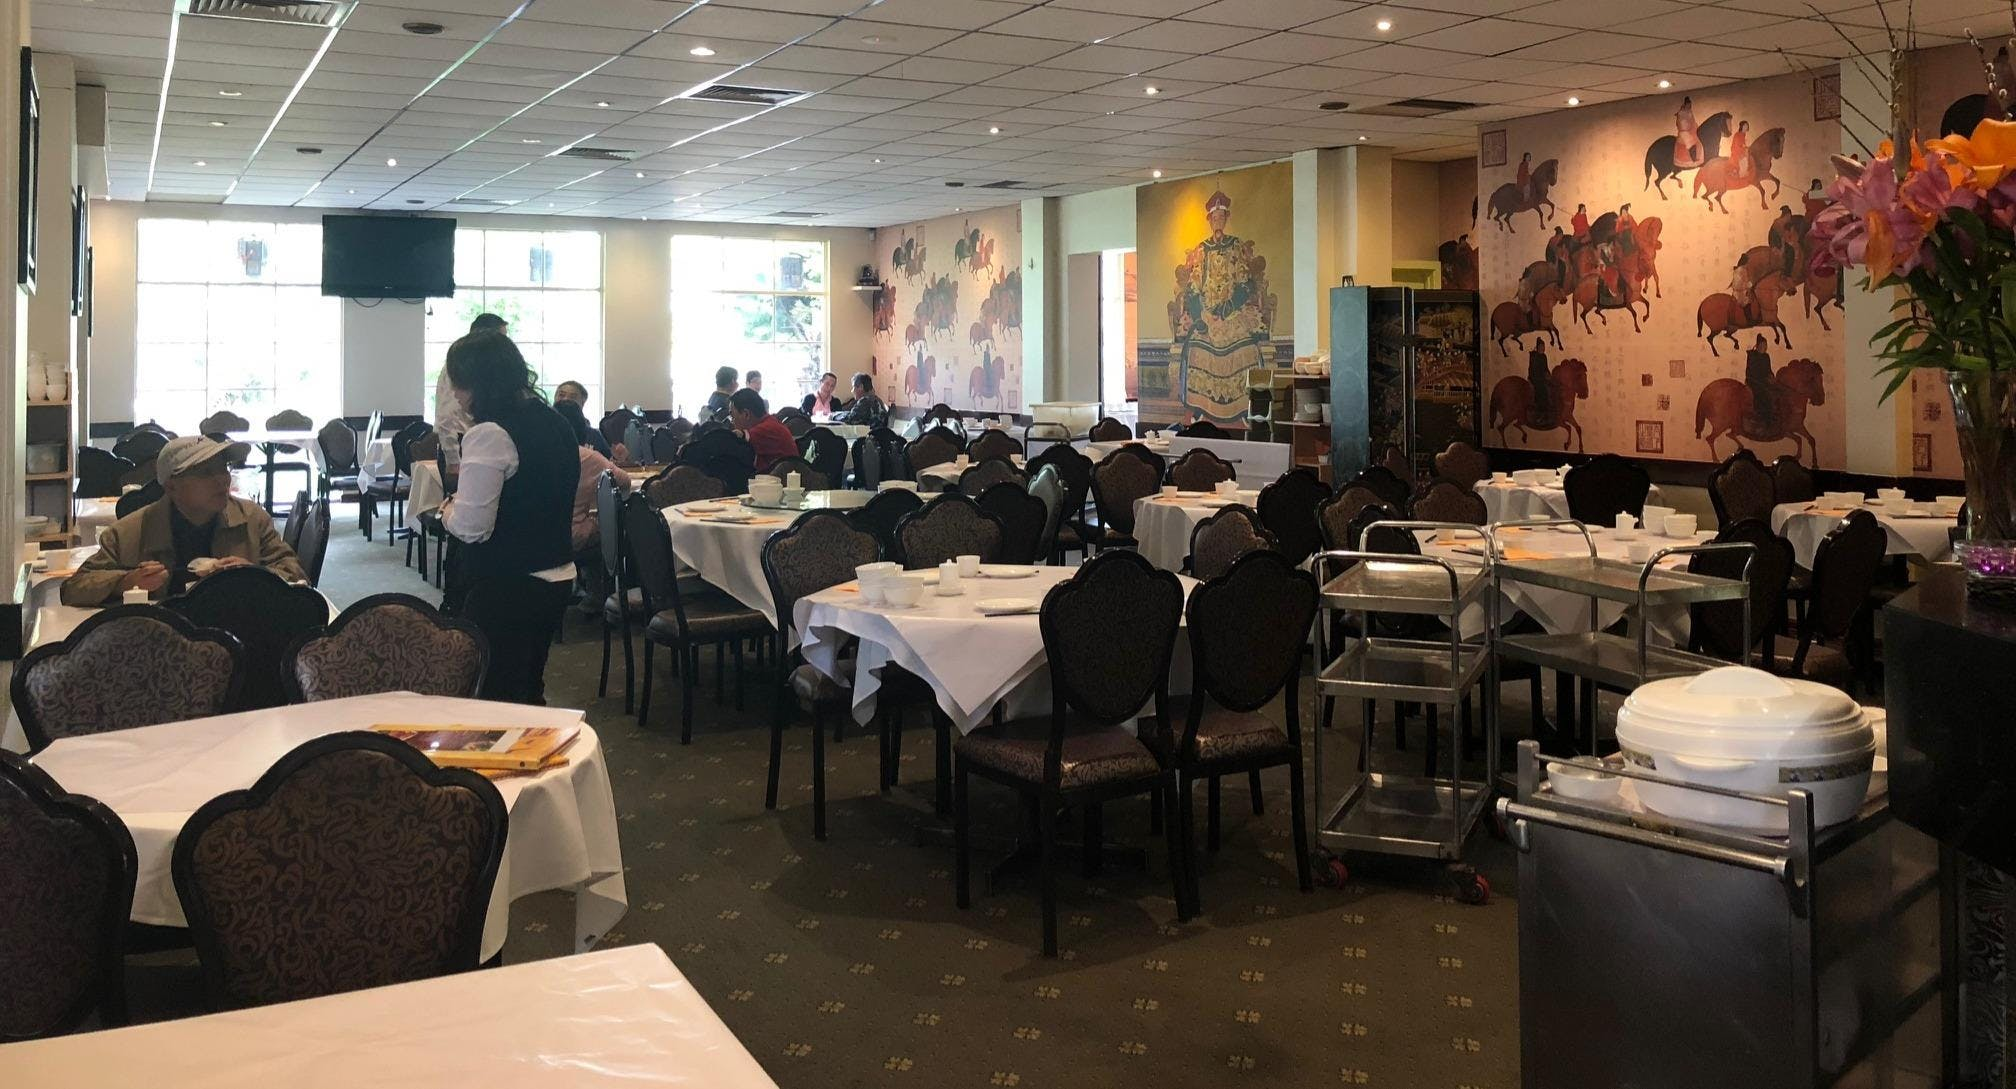 New Royal Garden Restaurant Melbourne image 1